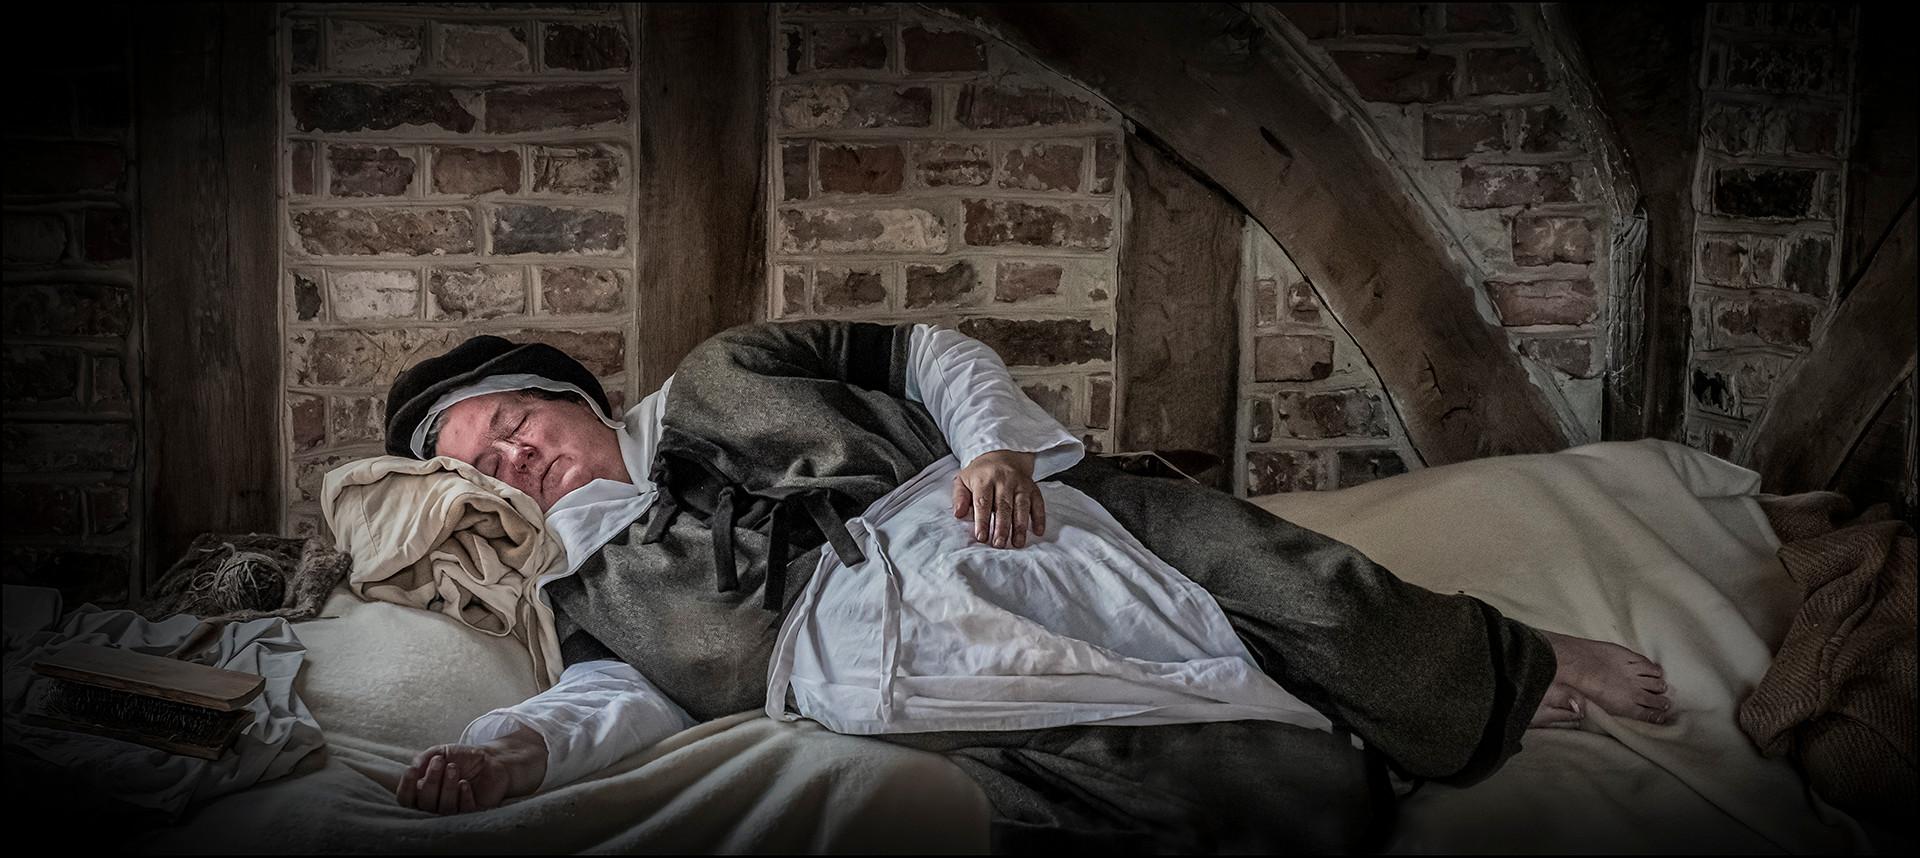 20 SLEEPING WOOL WORKER by Mick Dudley